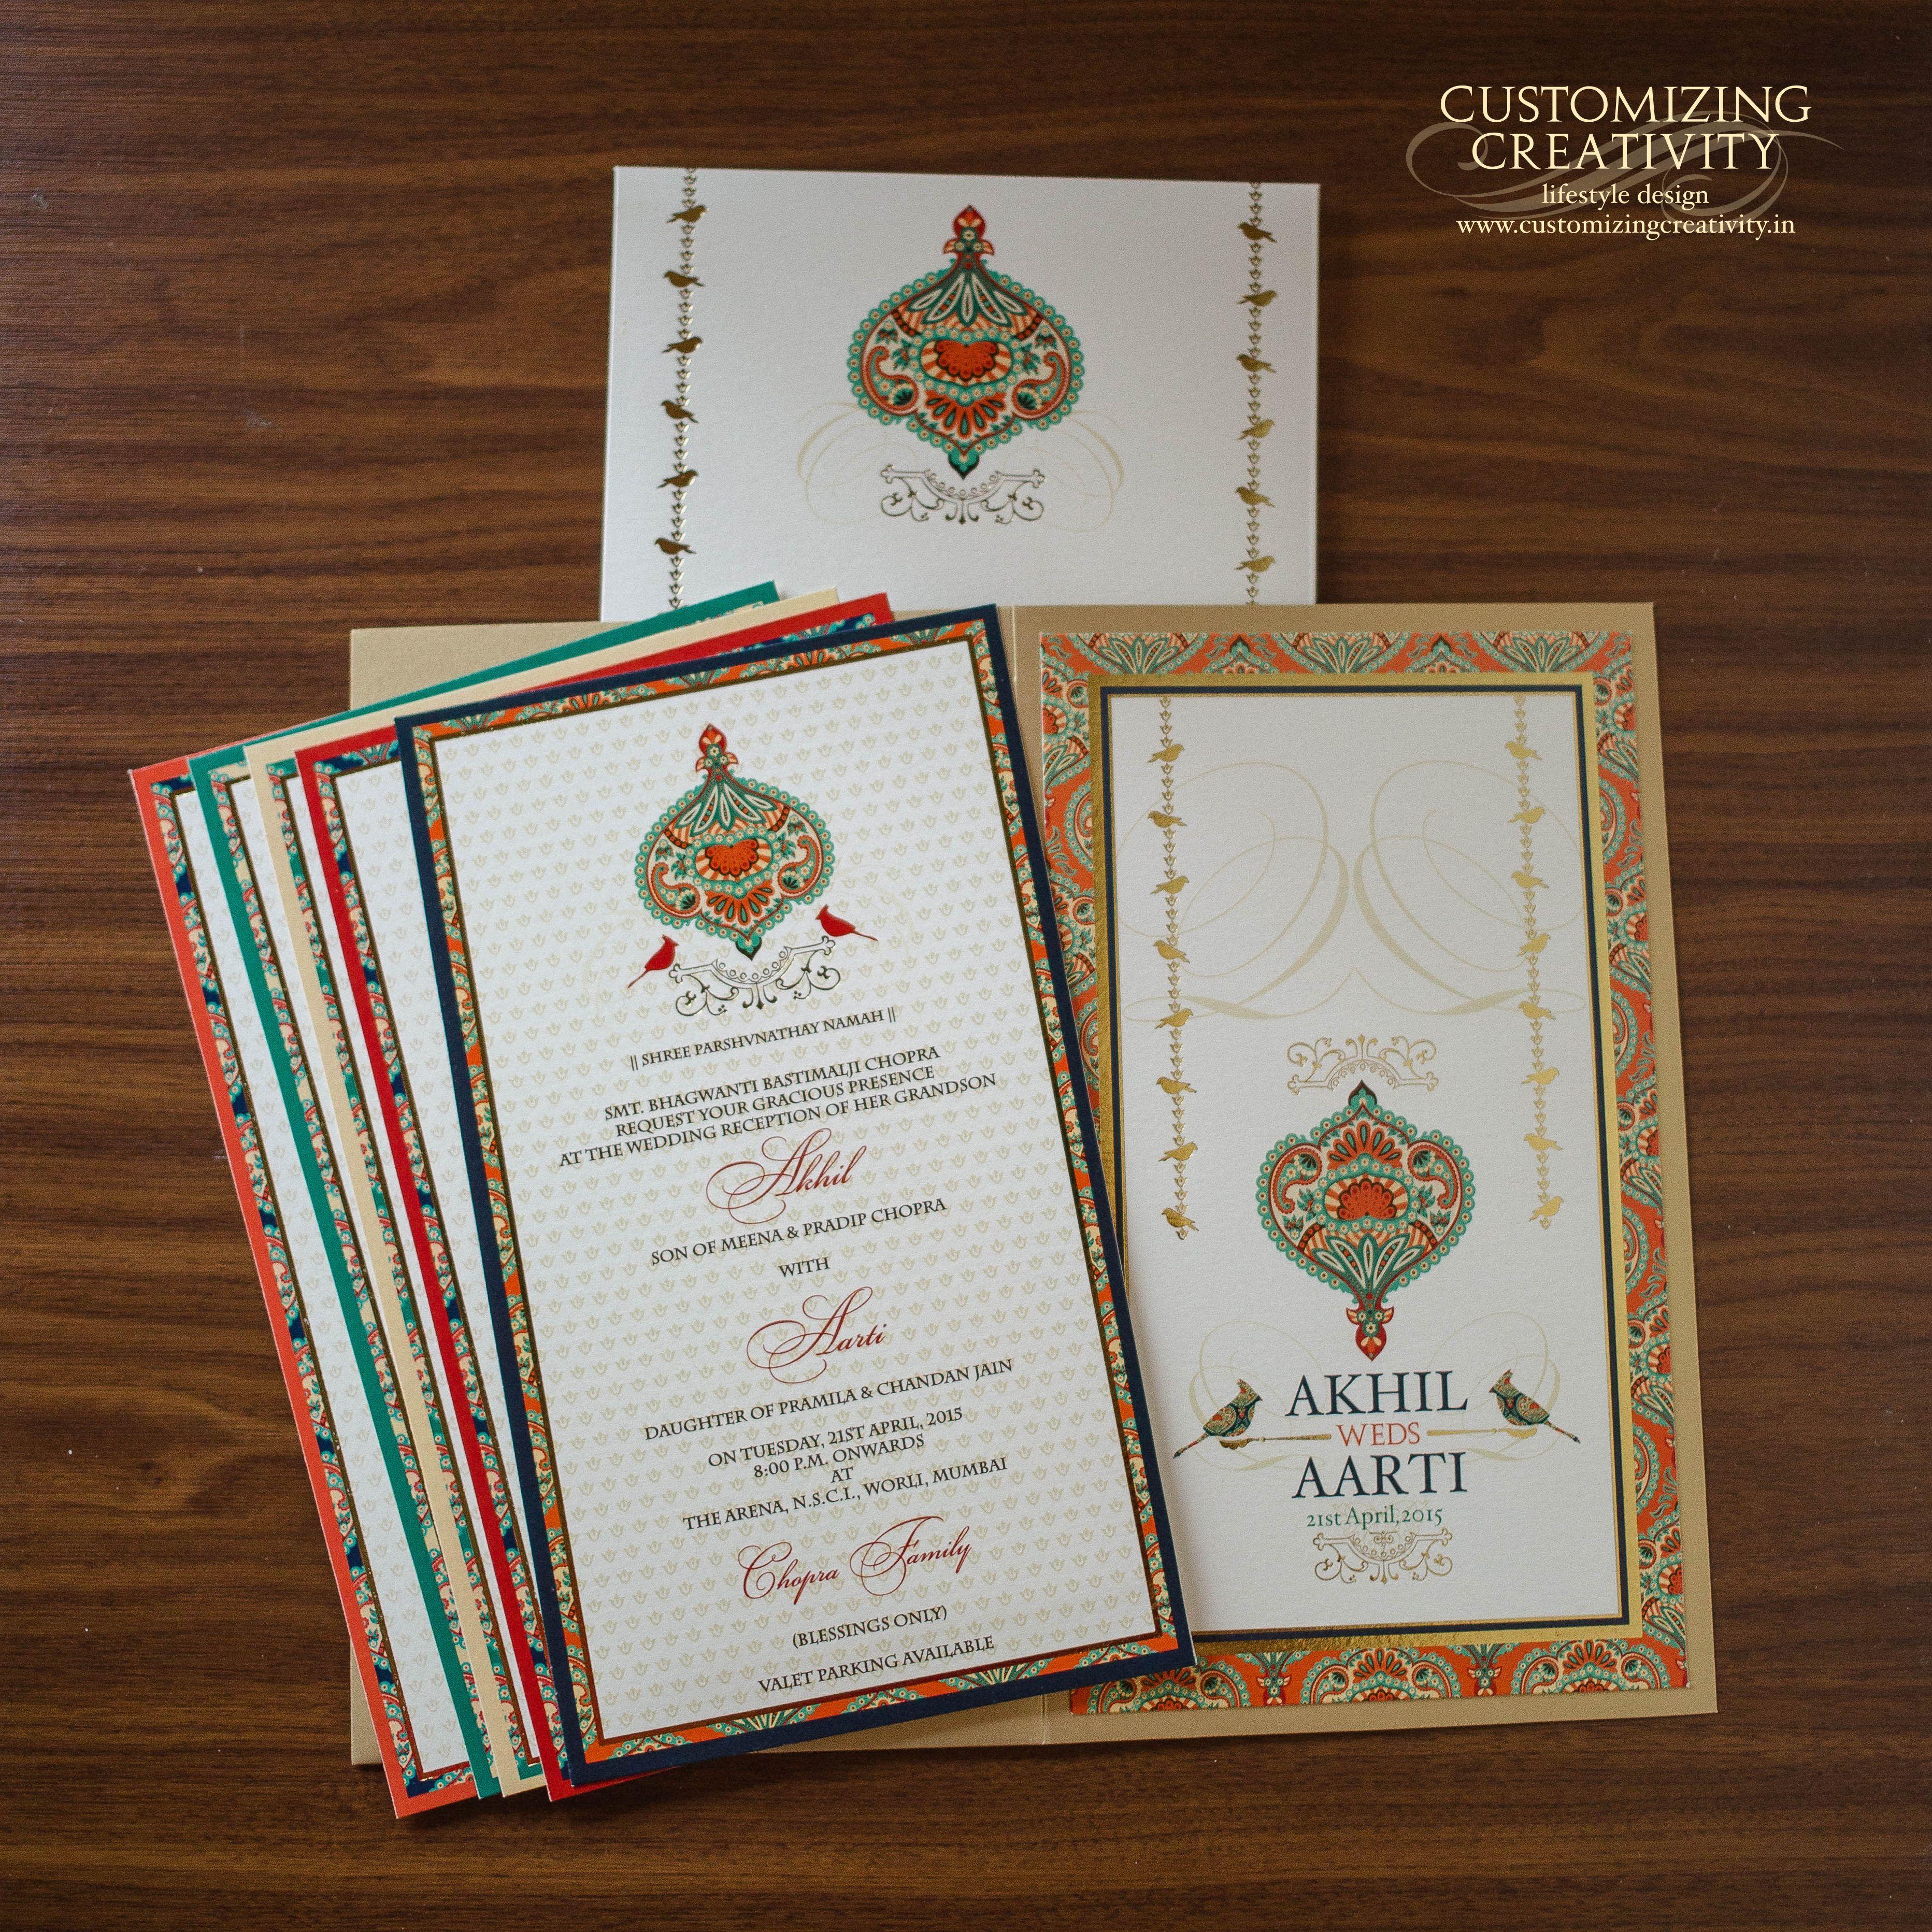 wedding invitation cards mumbai india%0A South Asian Bride  Invitation Cards  Wedding Invitations  Wedding Cards   Wedding Planning  Wedding Ideas  Creativity  Retro Style  Brides